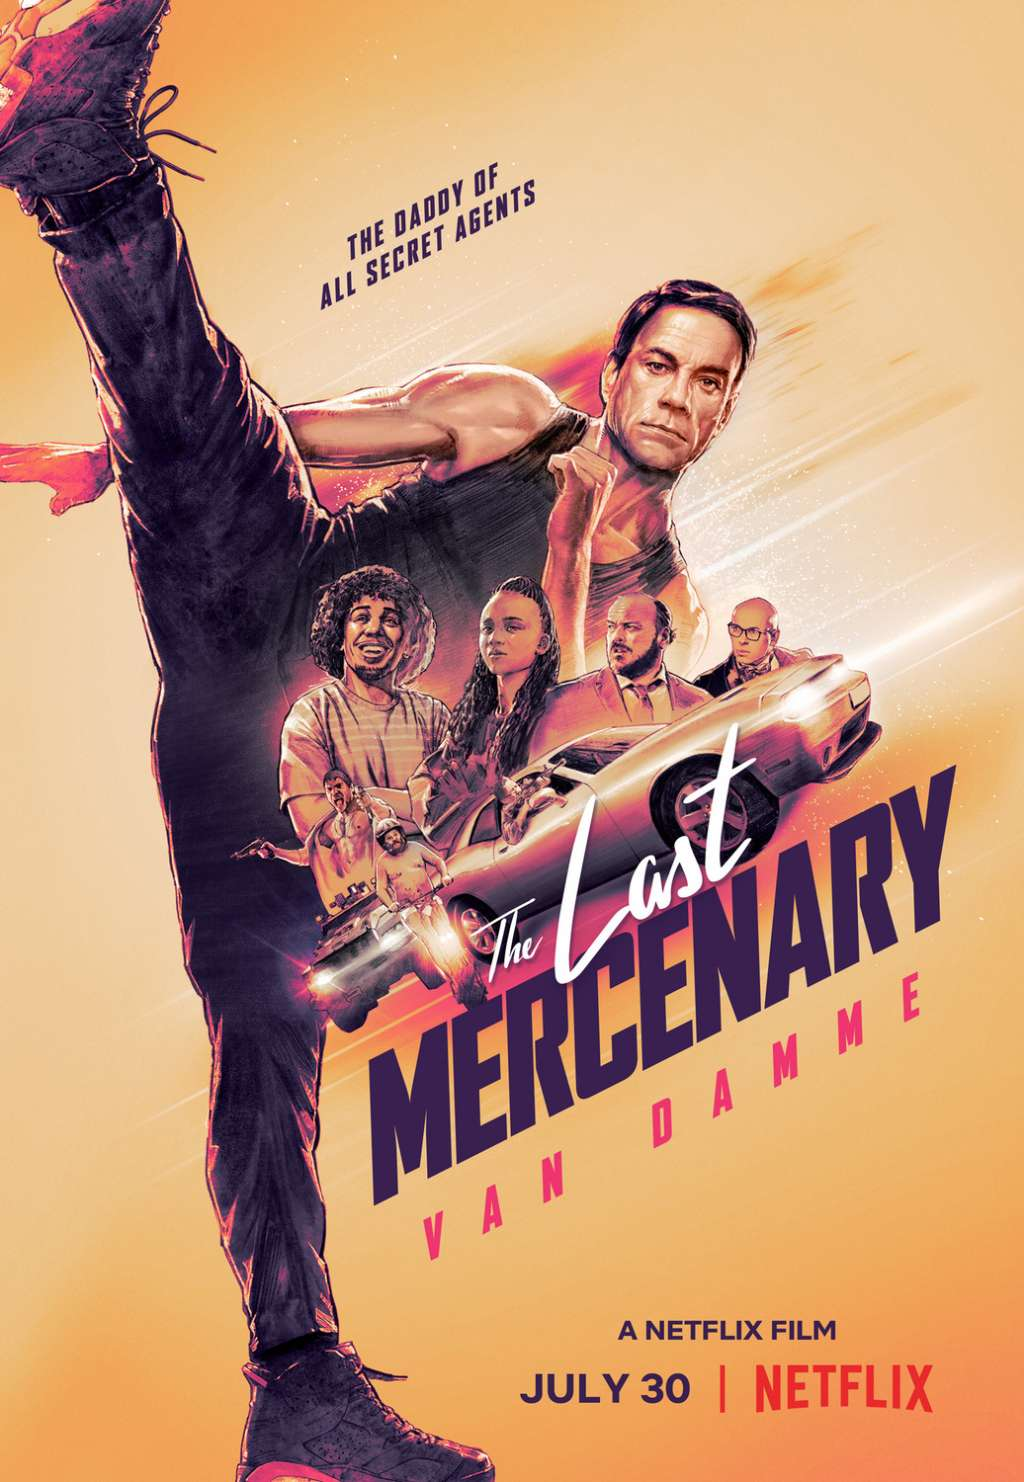 The Last Mercenary kapak